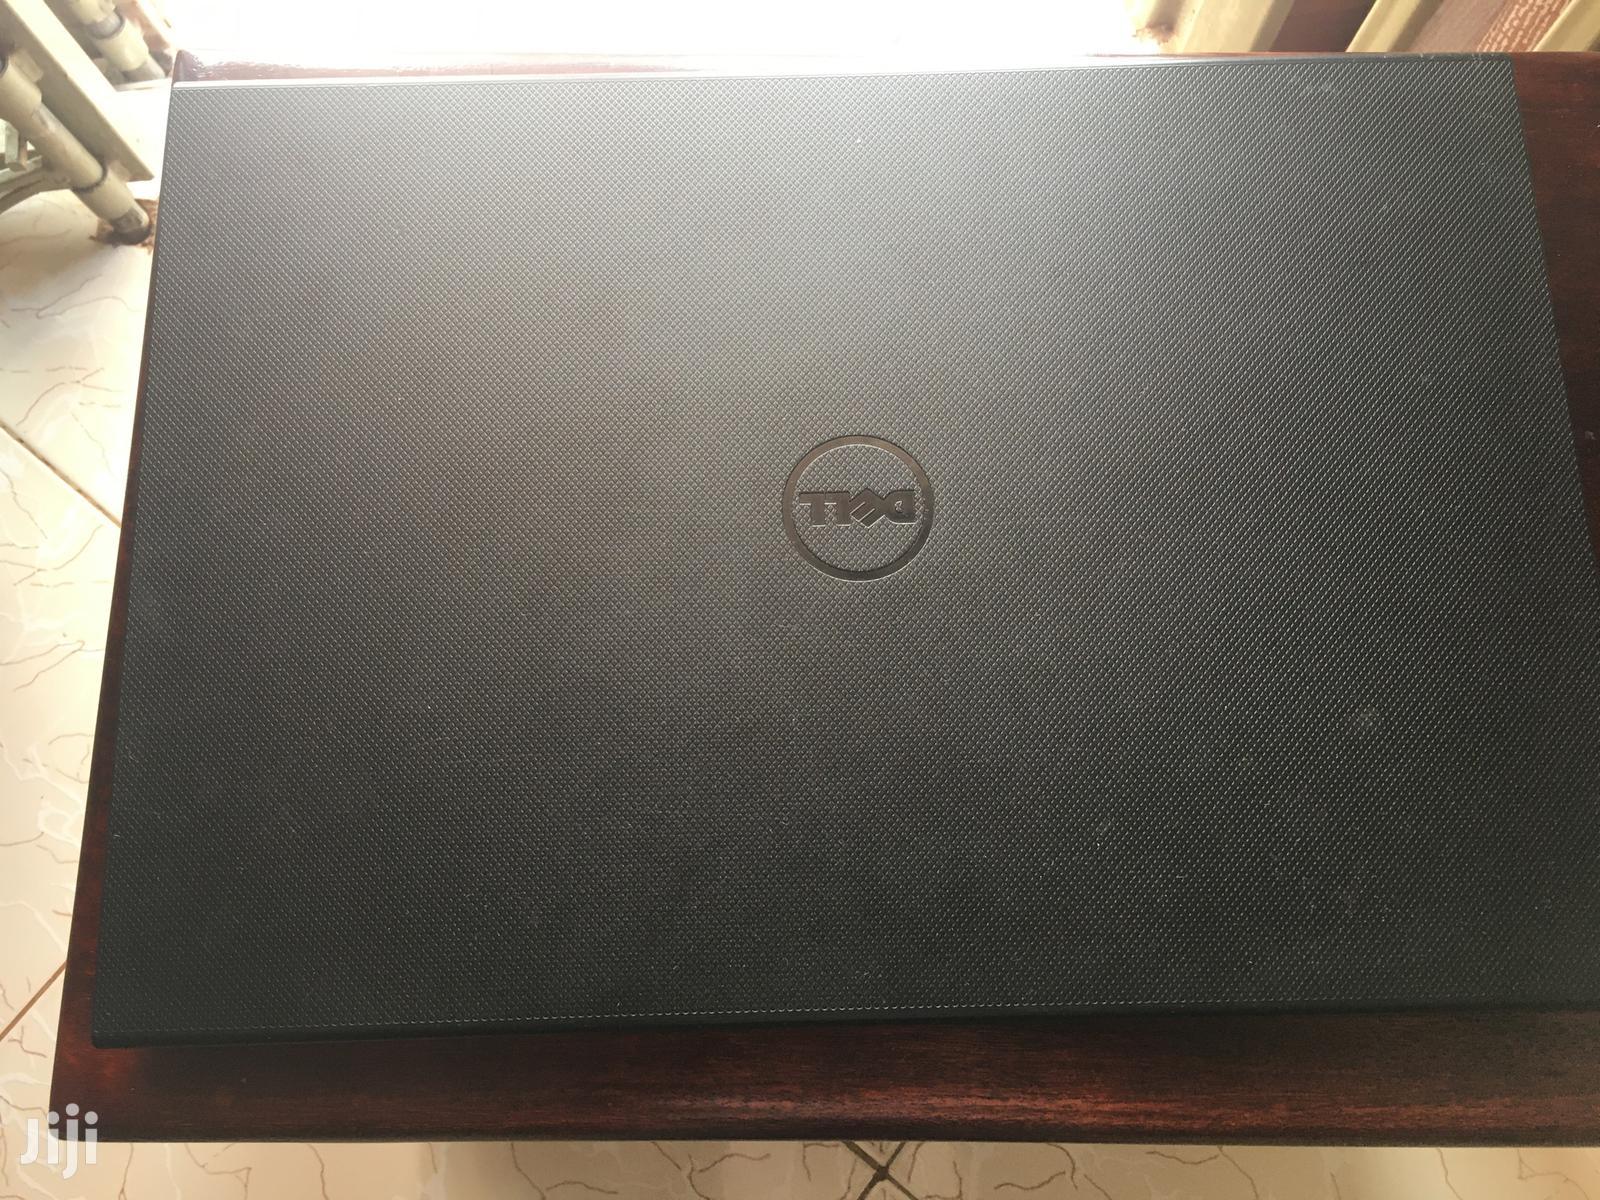 Archive: Laptop Dell Inspiron 15 3543 8GB Intel Core I7 HDD 500GB